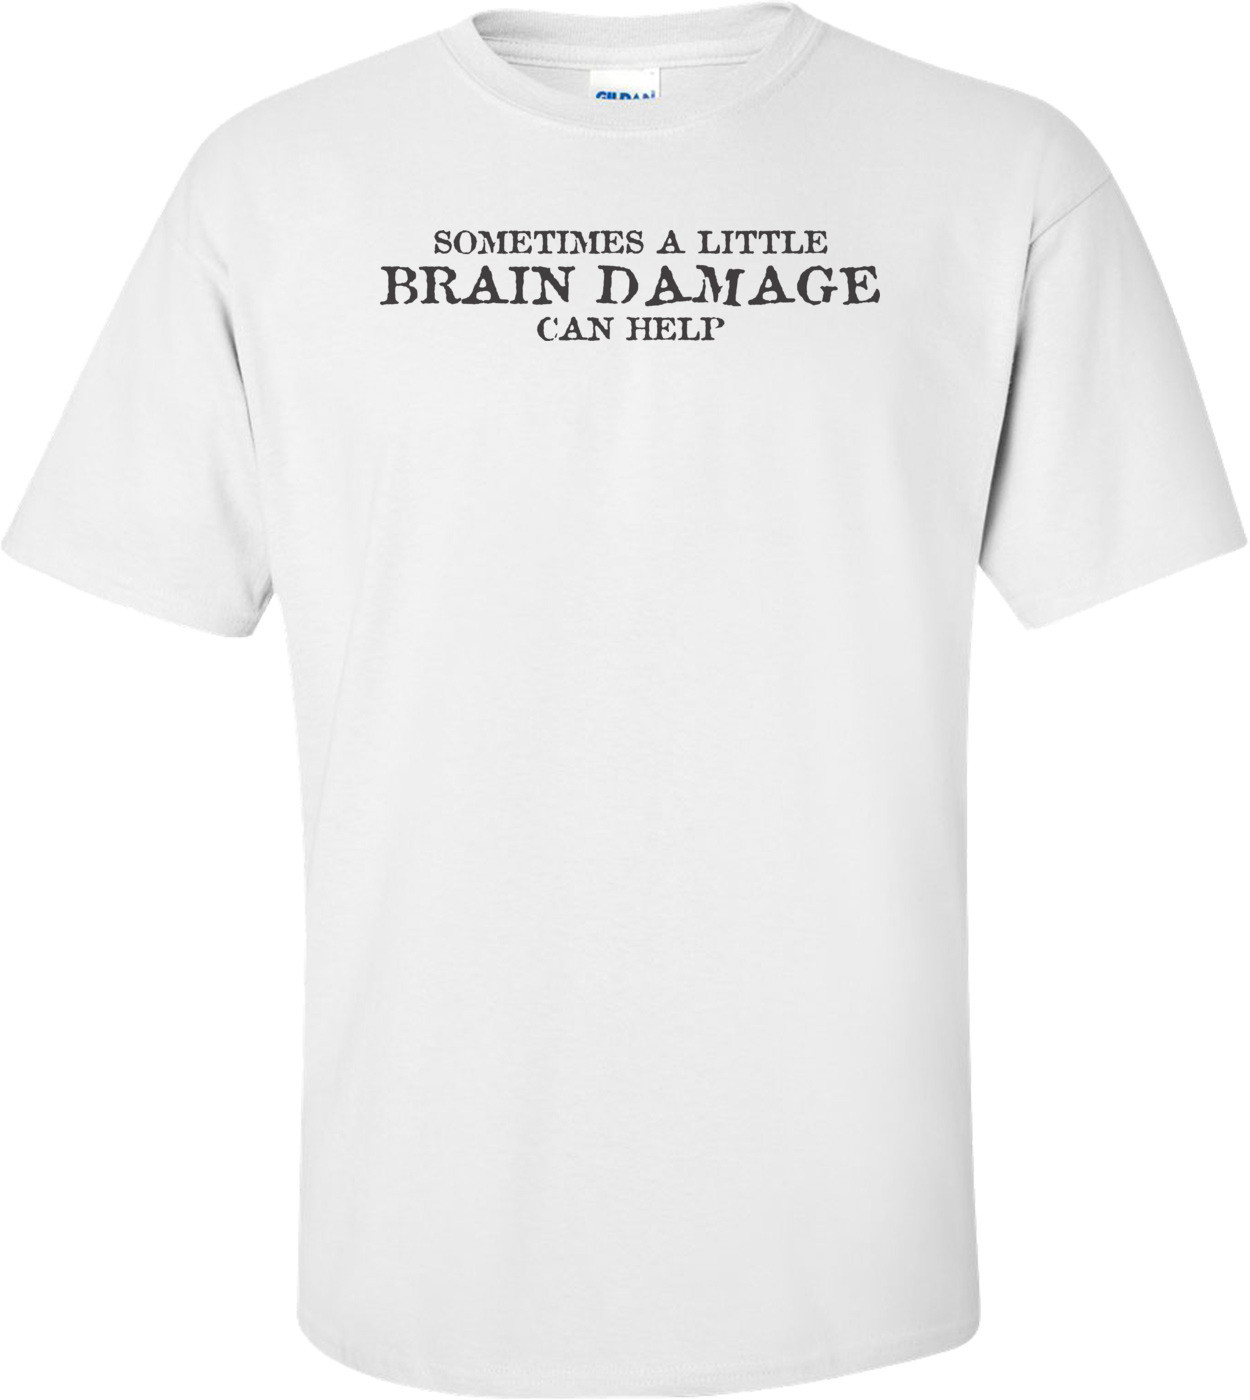 Sometimes A Little Brain Damage Can Help